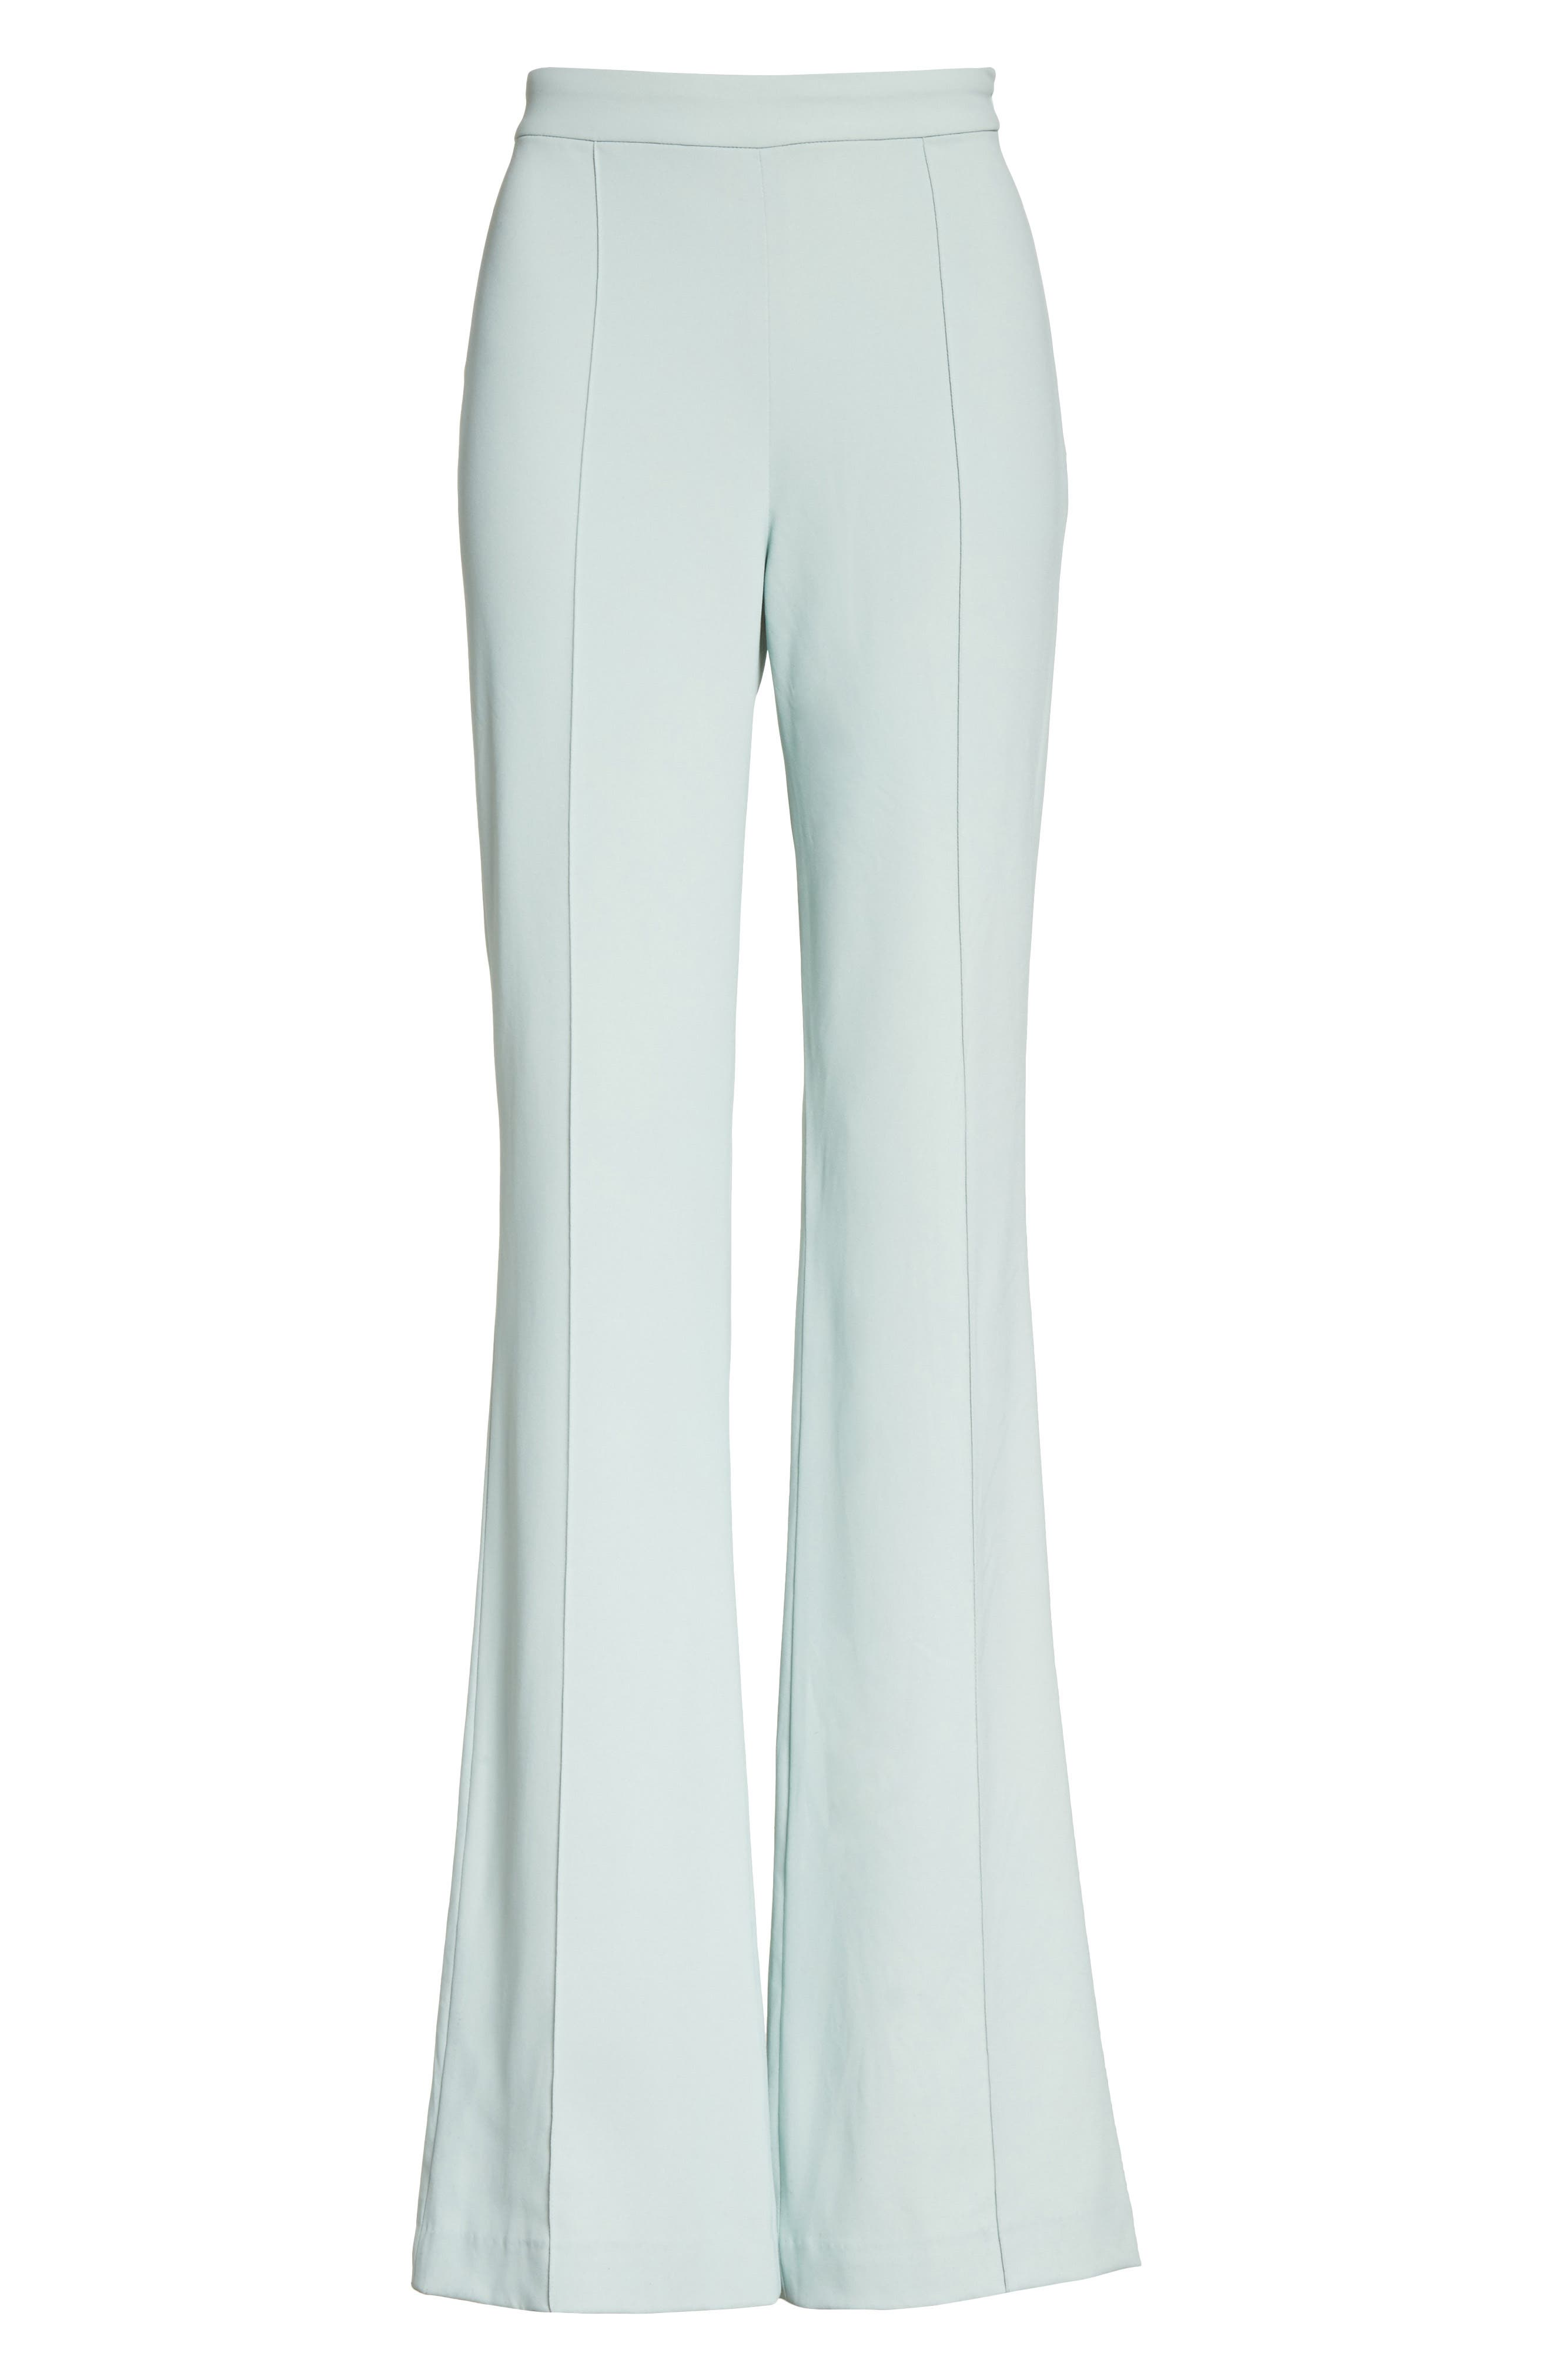 Jalisa High Waist Flared Leg Pants,                             Alternate thumbnail 6, color,                             Light Dusty Aqua